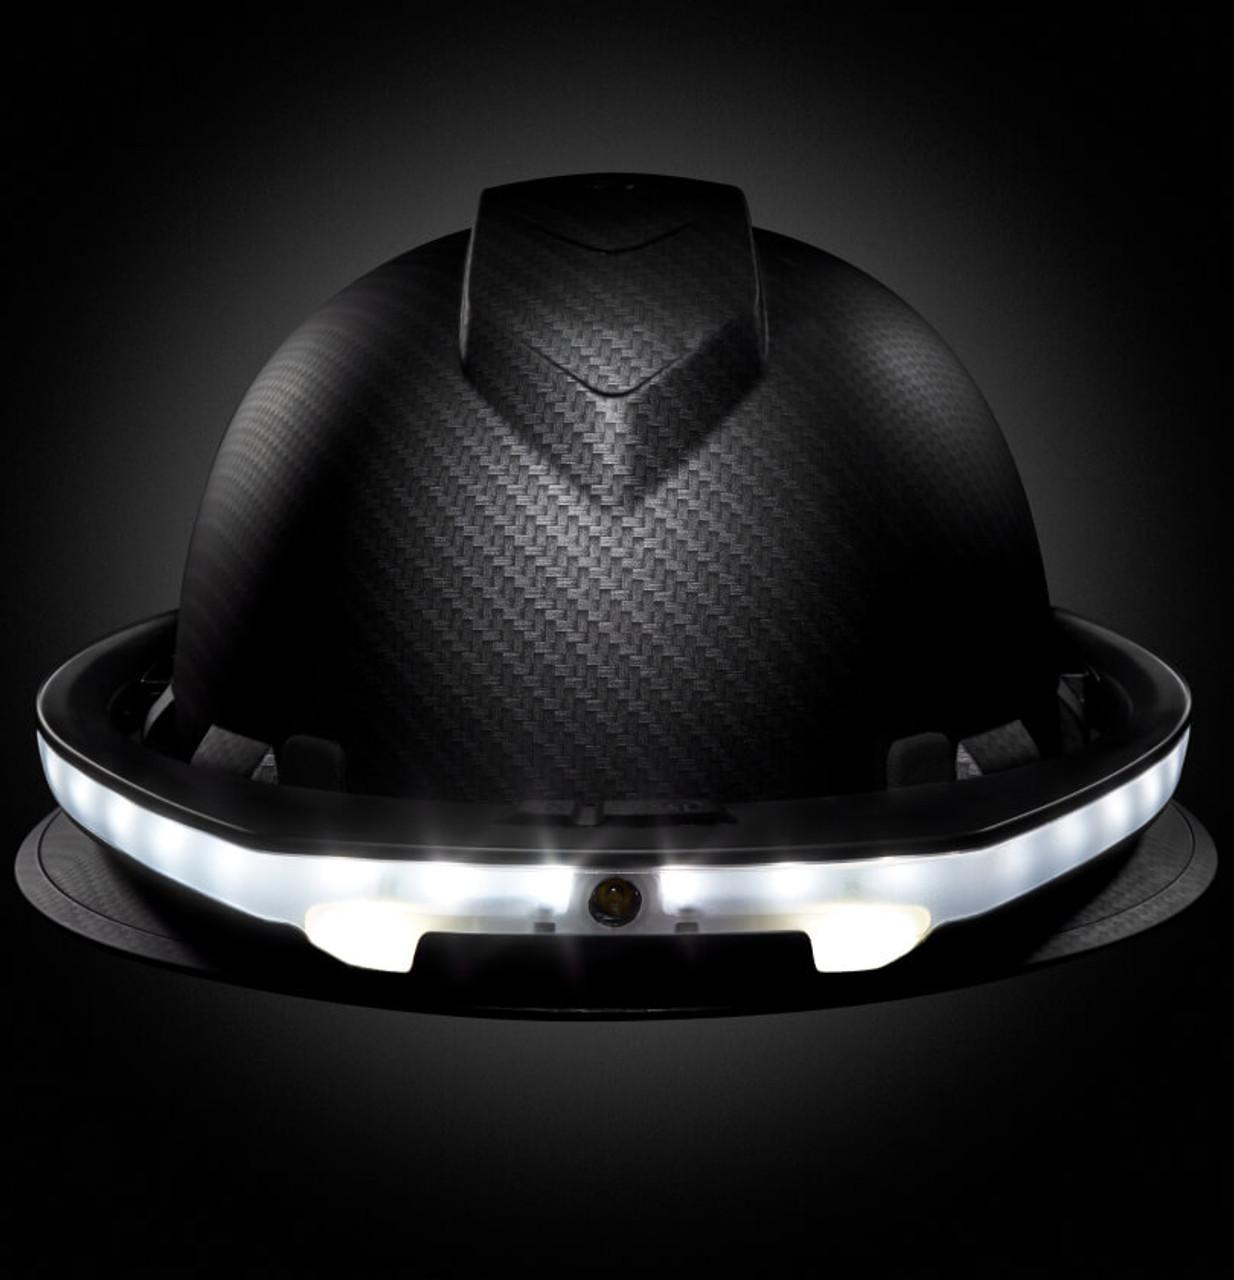 New Halo SL personal task light